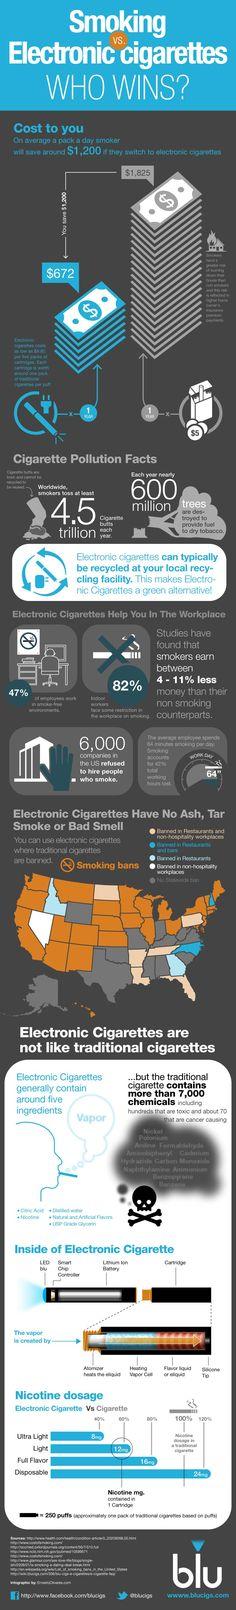 "Blu ecigs infographic ""smoking vs electronic cigarettes : who wins?"""